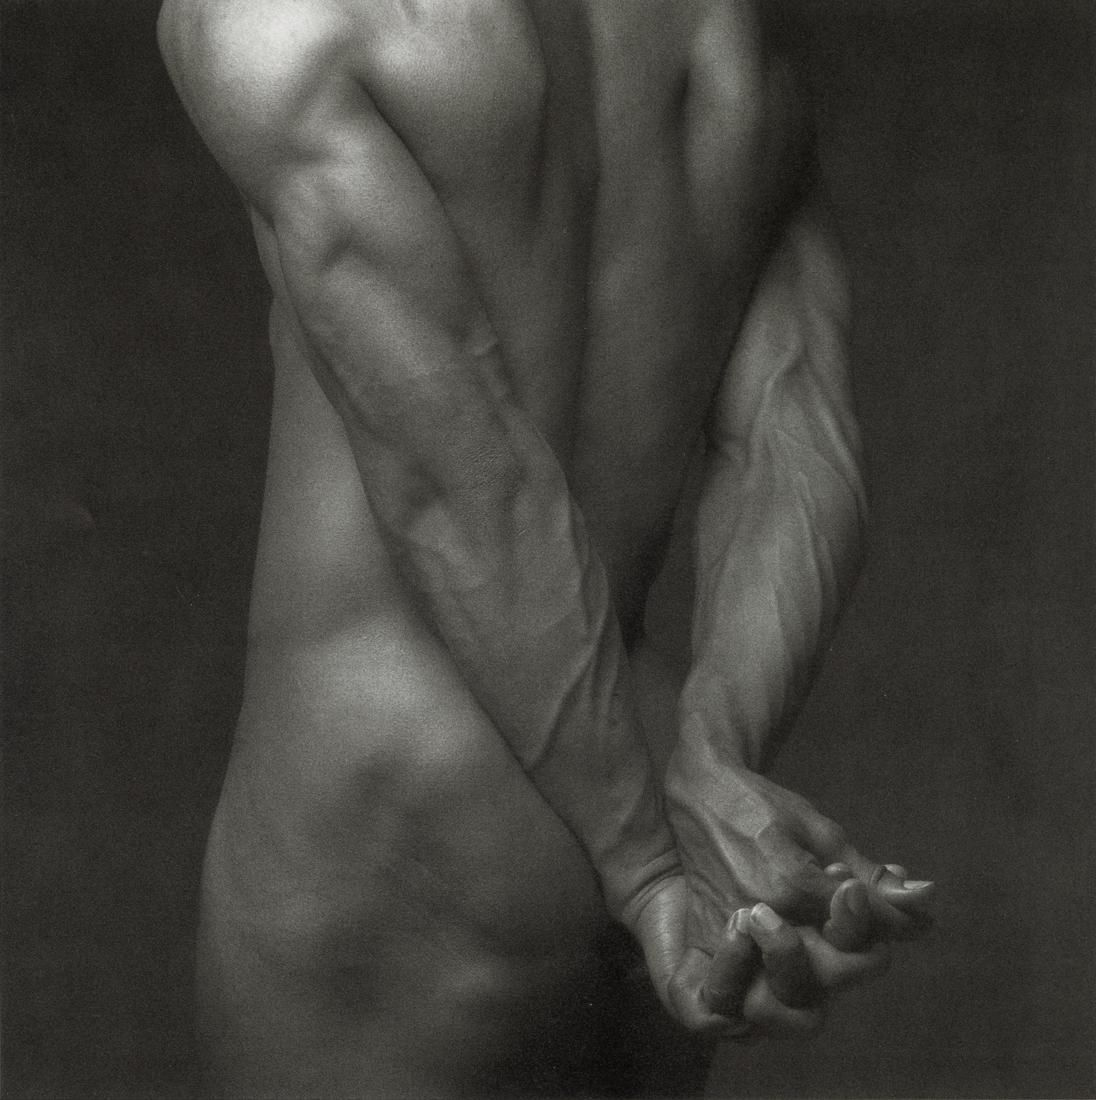 BARBARA BORDNICK - Nude Waiting, 1996